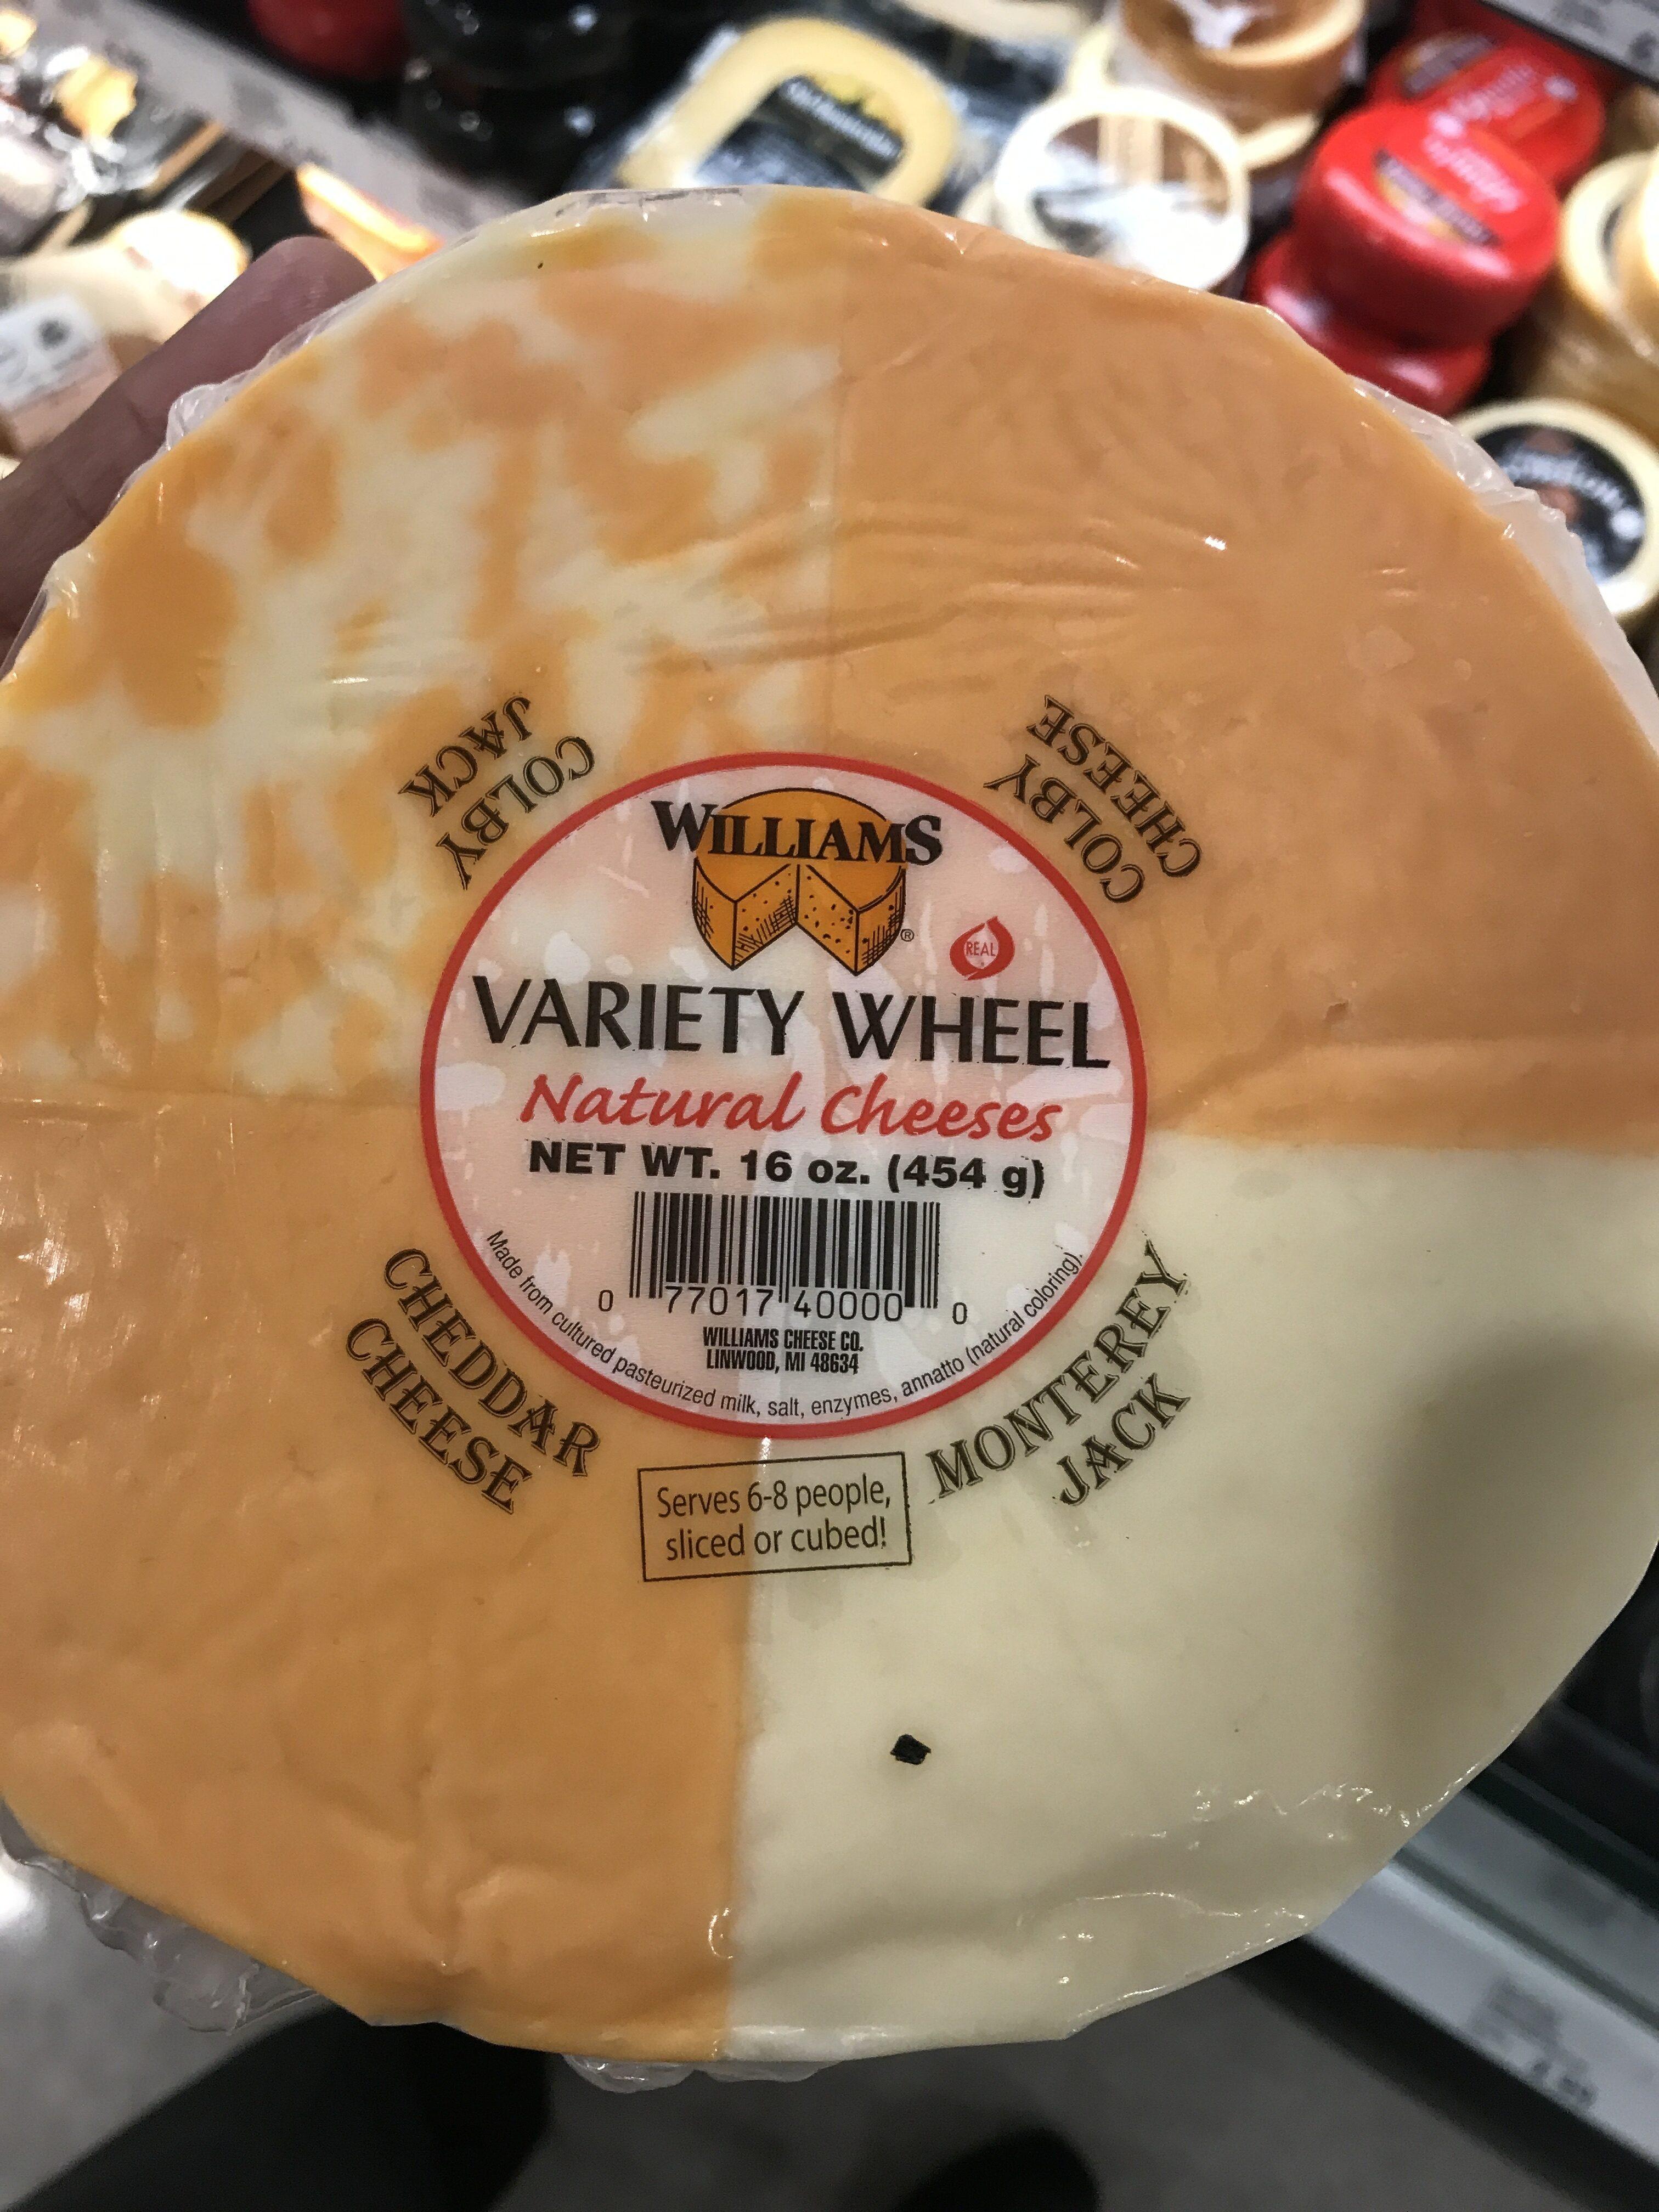 Williams, variety wheel natural cheeses - Product - en